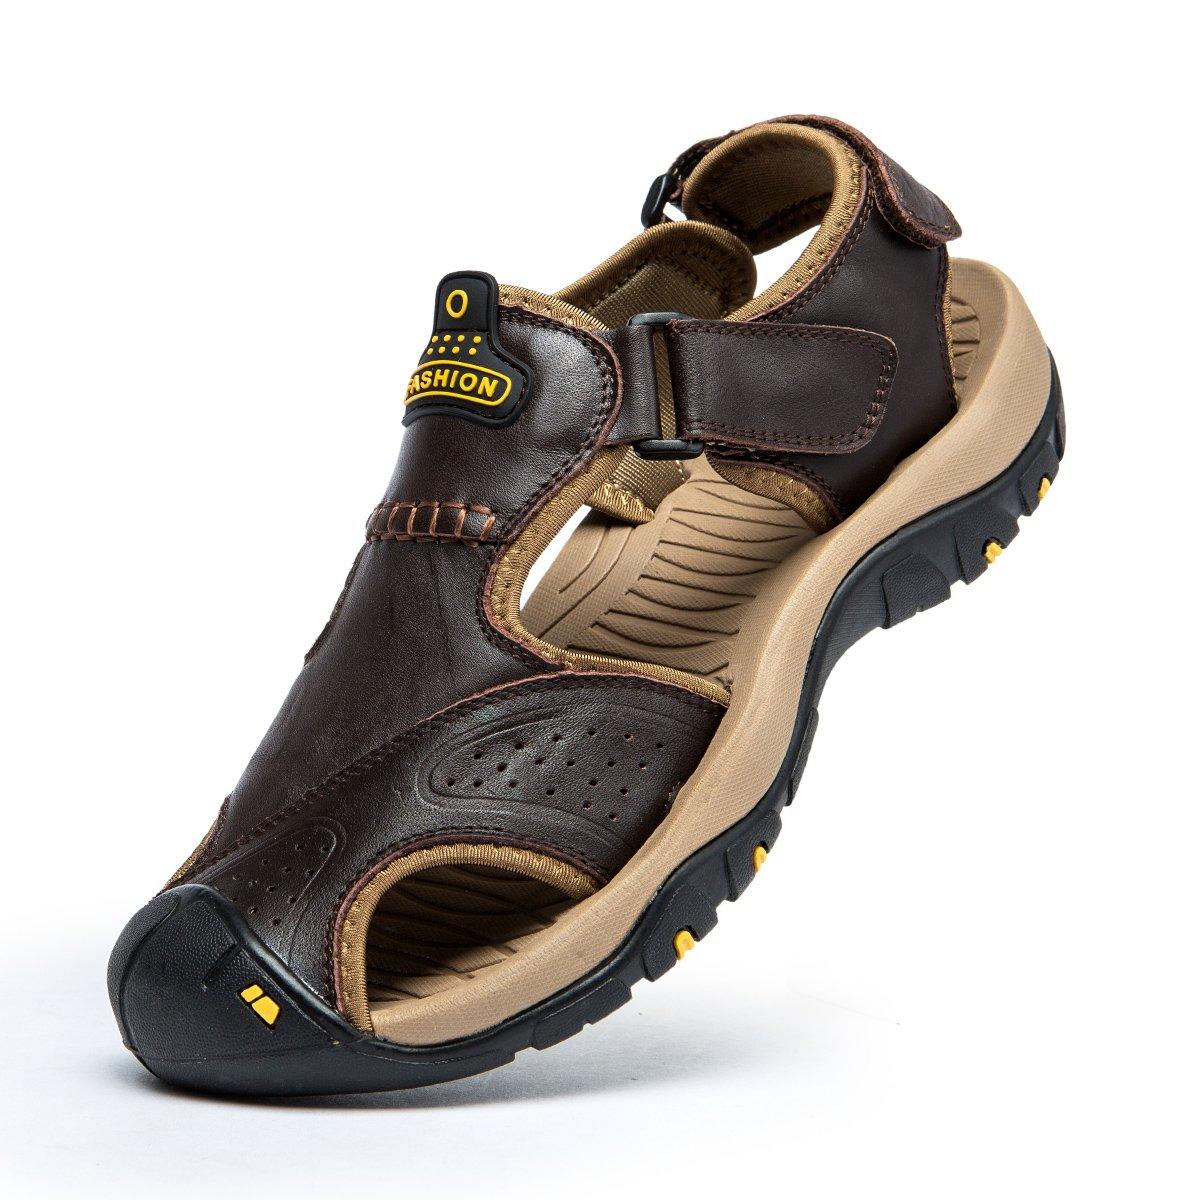 SONLLEIVOO Mens Sports Sandals Outdoor Beach Leather Water Sandal Fisherman Athletics Shoes(Dark Brown,43-9.5)